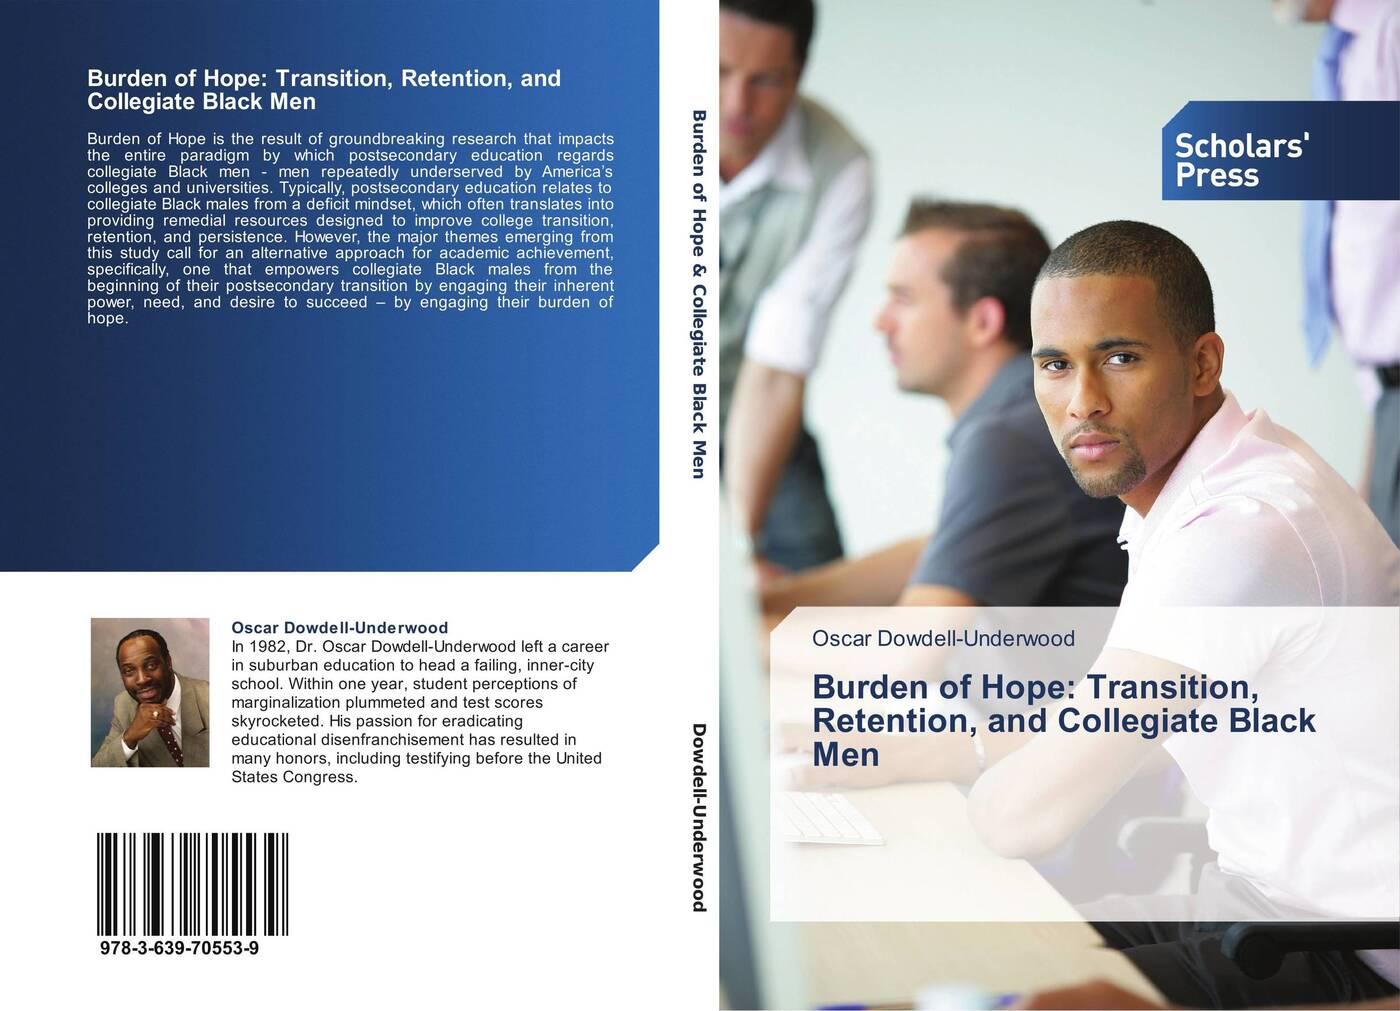 Oscar Dowdell-Underwood Burden of Hope: Transition, Retention, and Collegiate Black Men